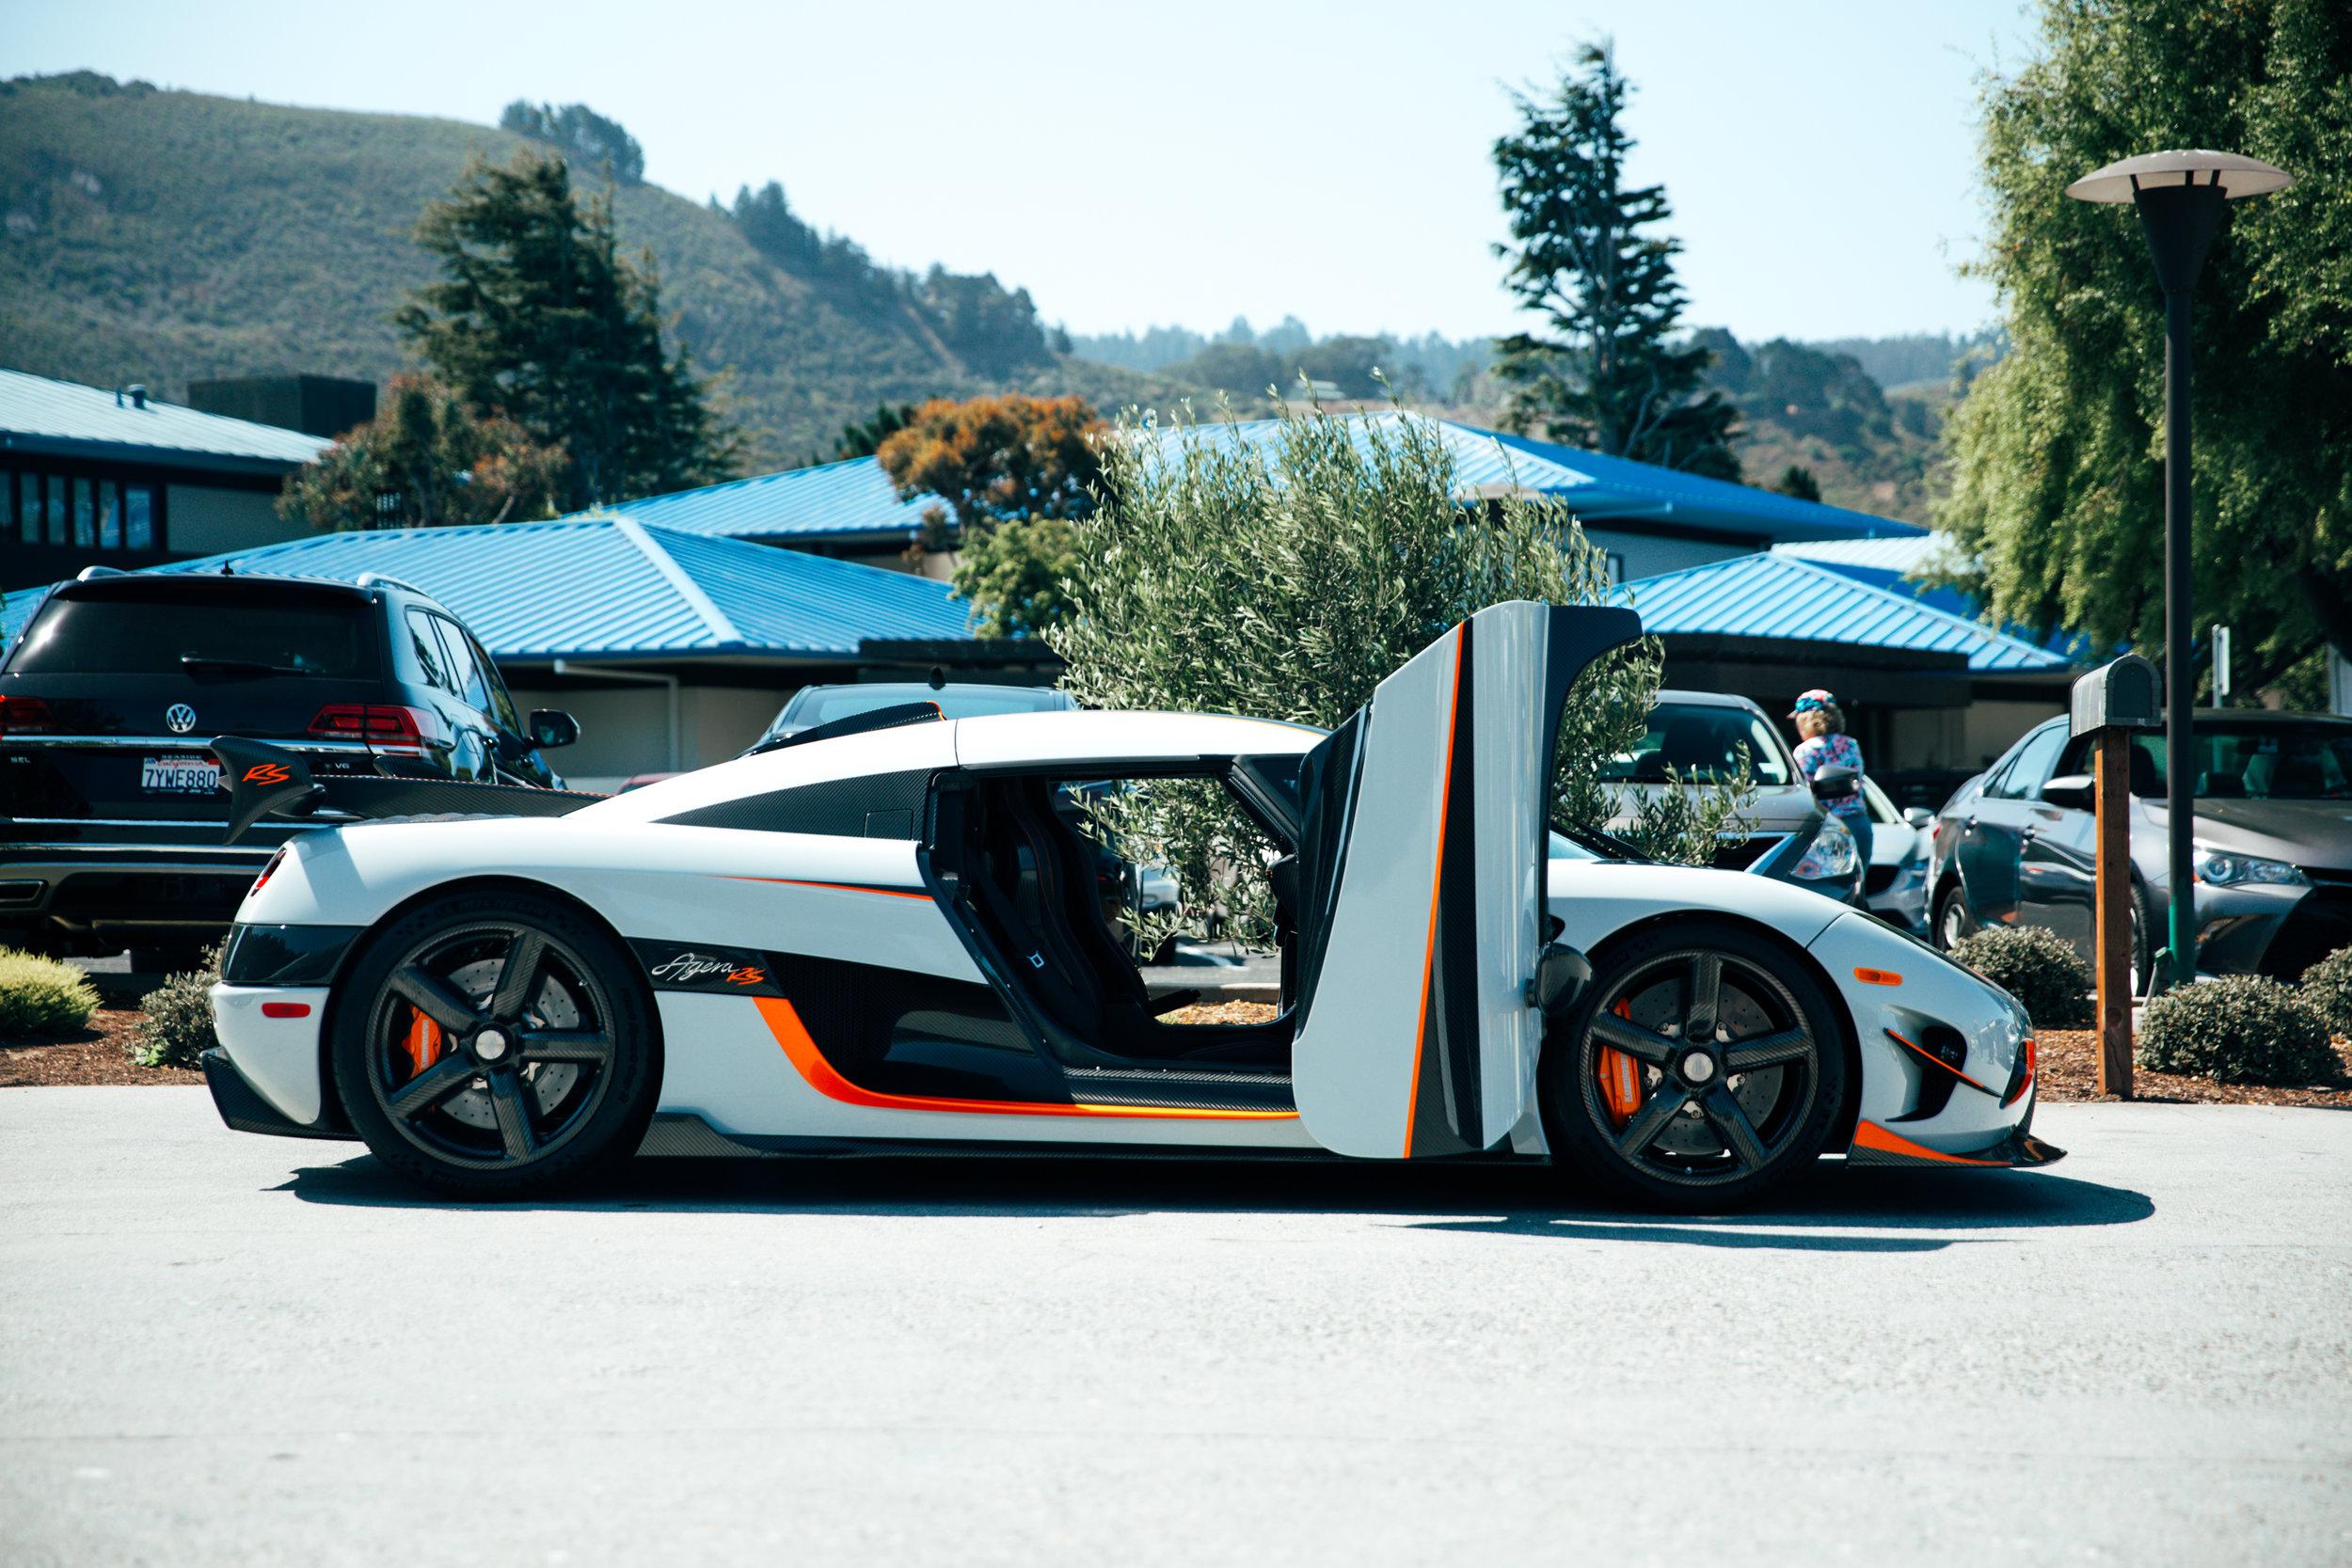 Stay_Driven_Monterey_Car_Week_Koenigsegg-73.jpg